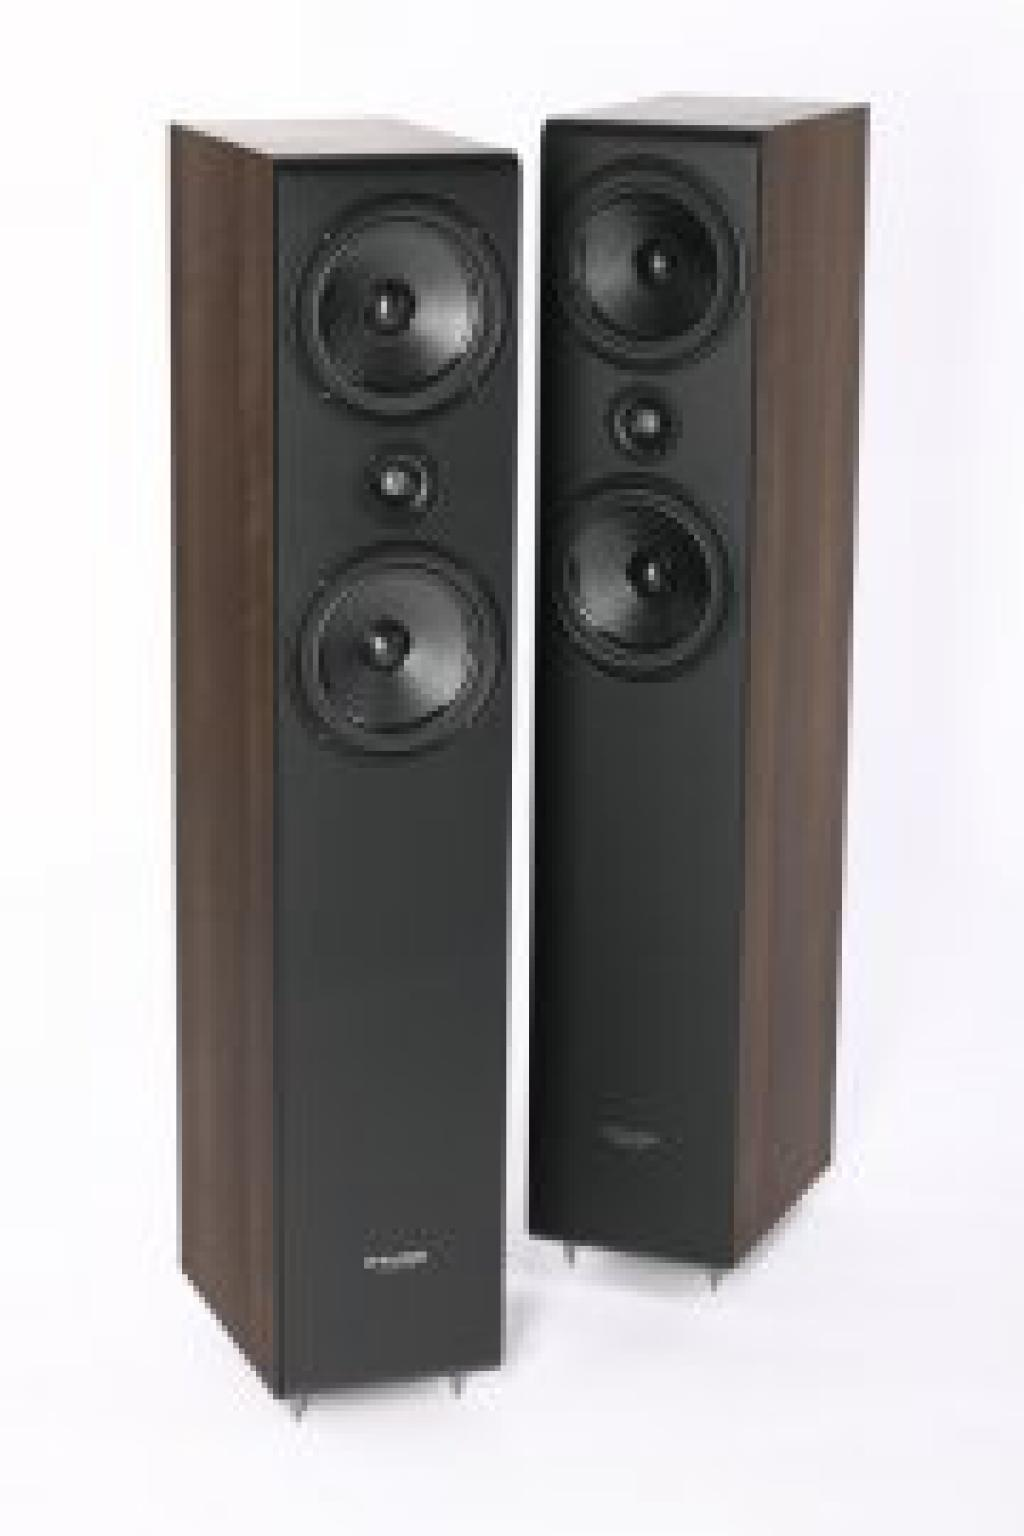 Boxe Pylon Audio Opal 23 Wenge